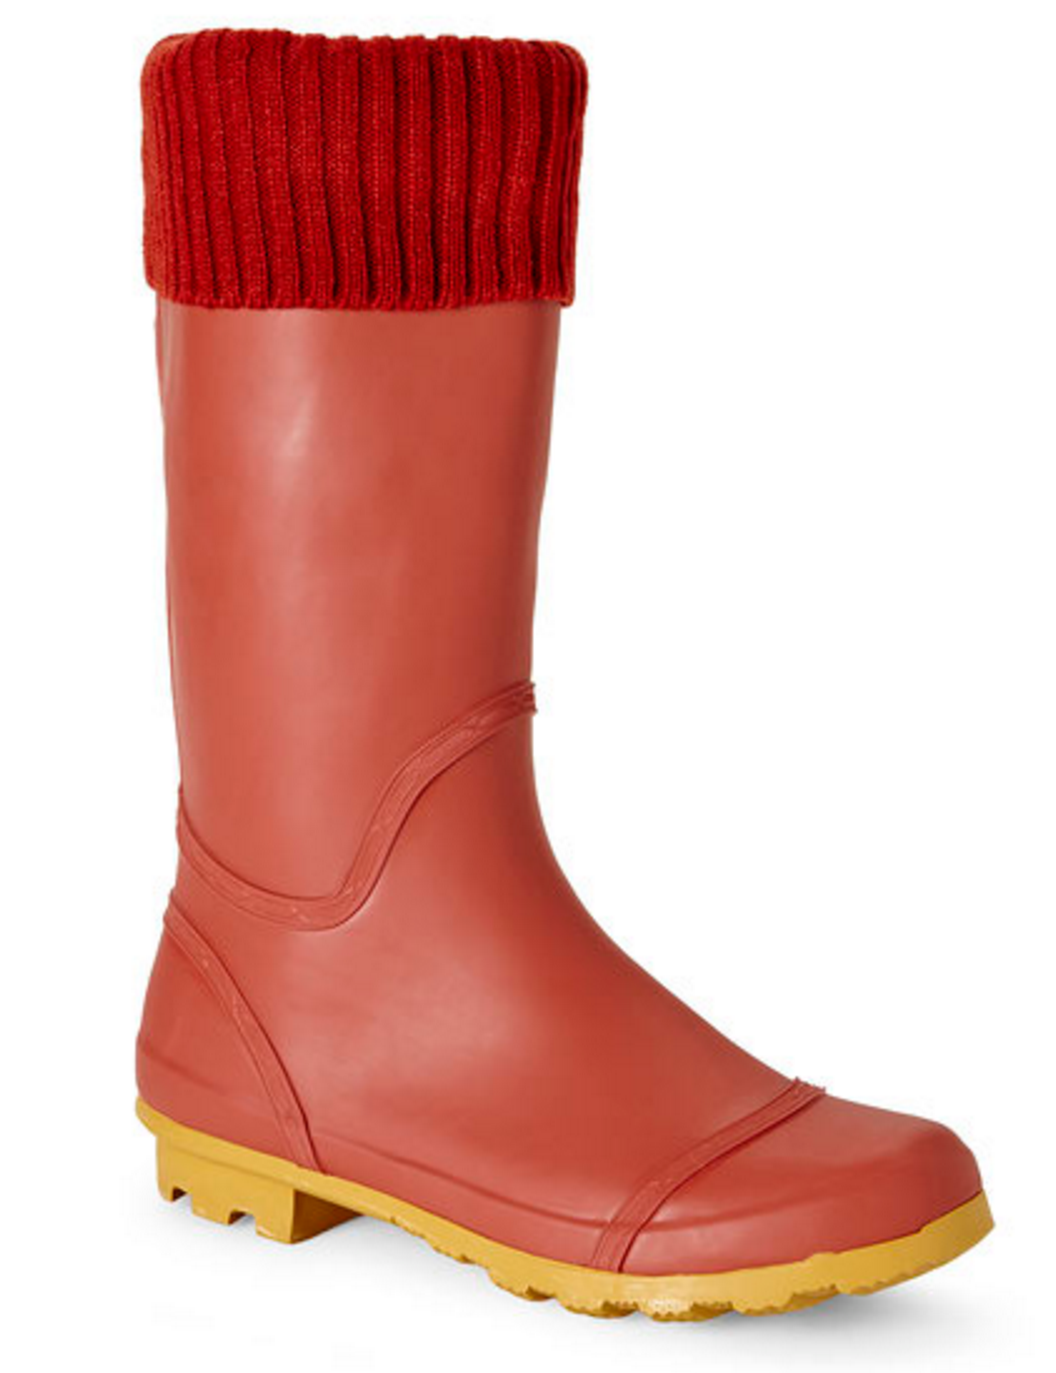 Henry Ferrera Red Knit Cuff Rain Boots